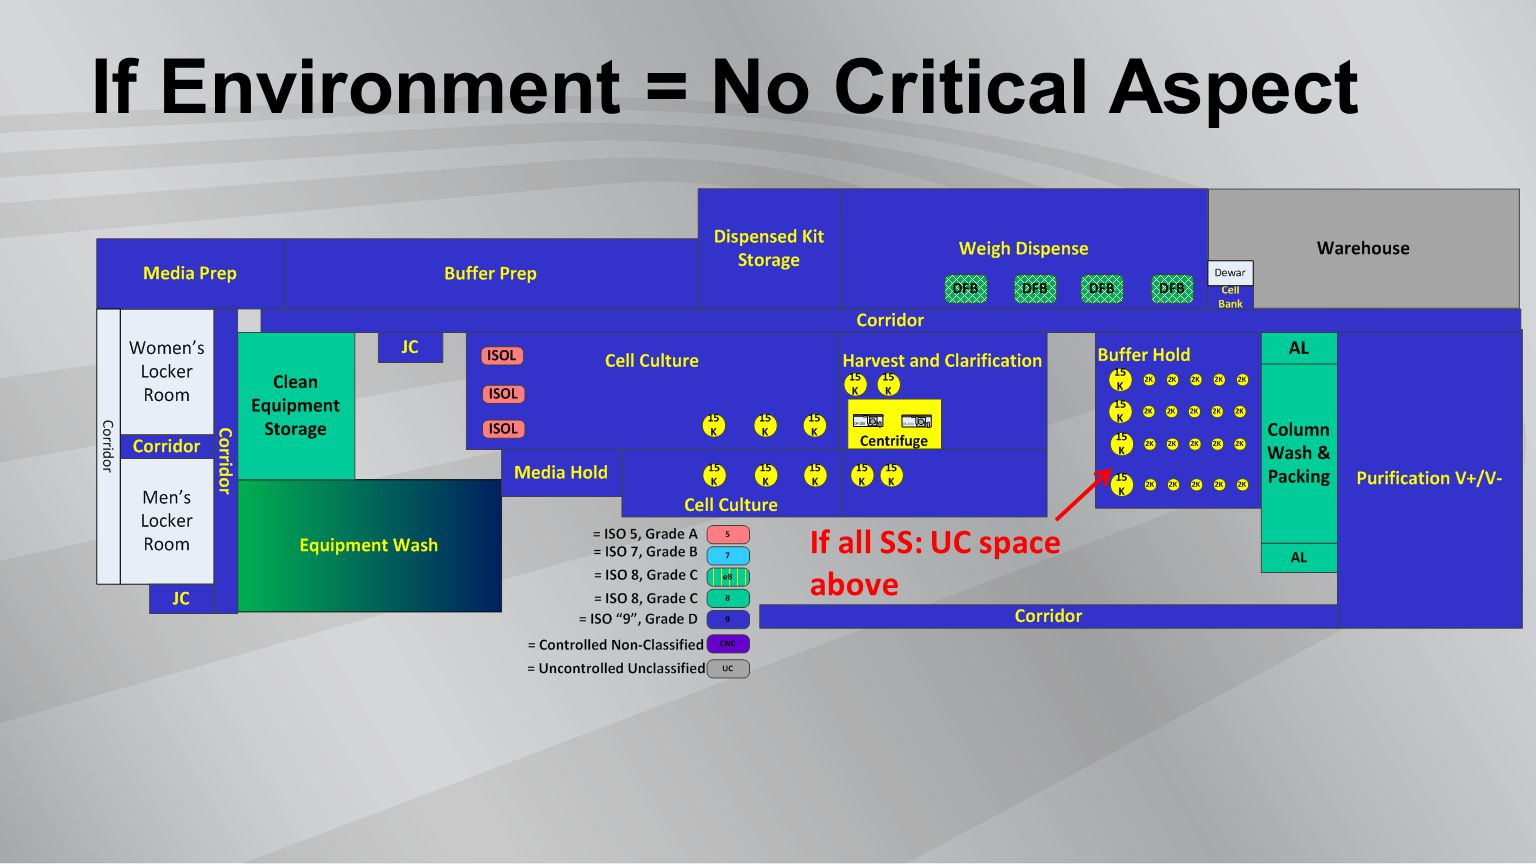 If Environment = No Critical Aspect